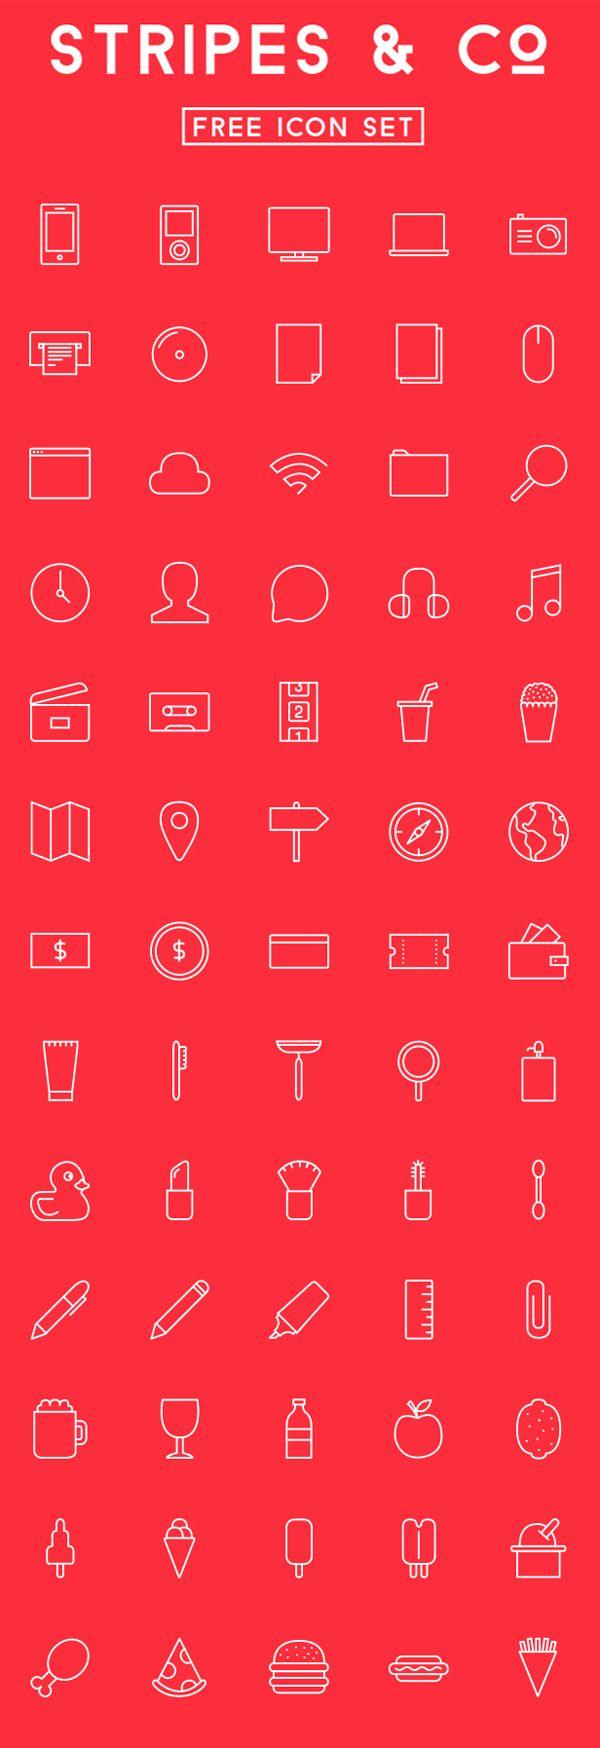 Free icon Set (65 Icons) #outlineicons #strokeicons #freeicons #vectoricons #psdicons #webfonts